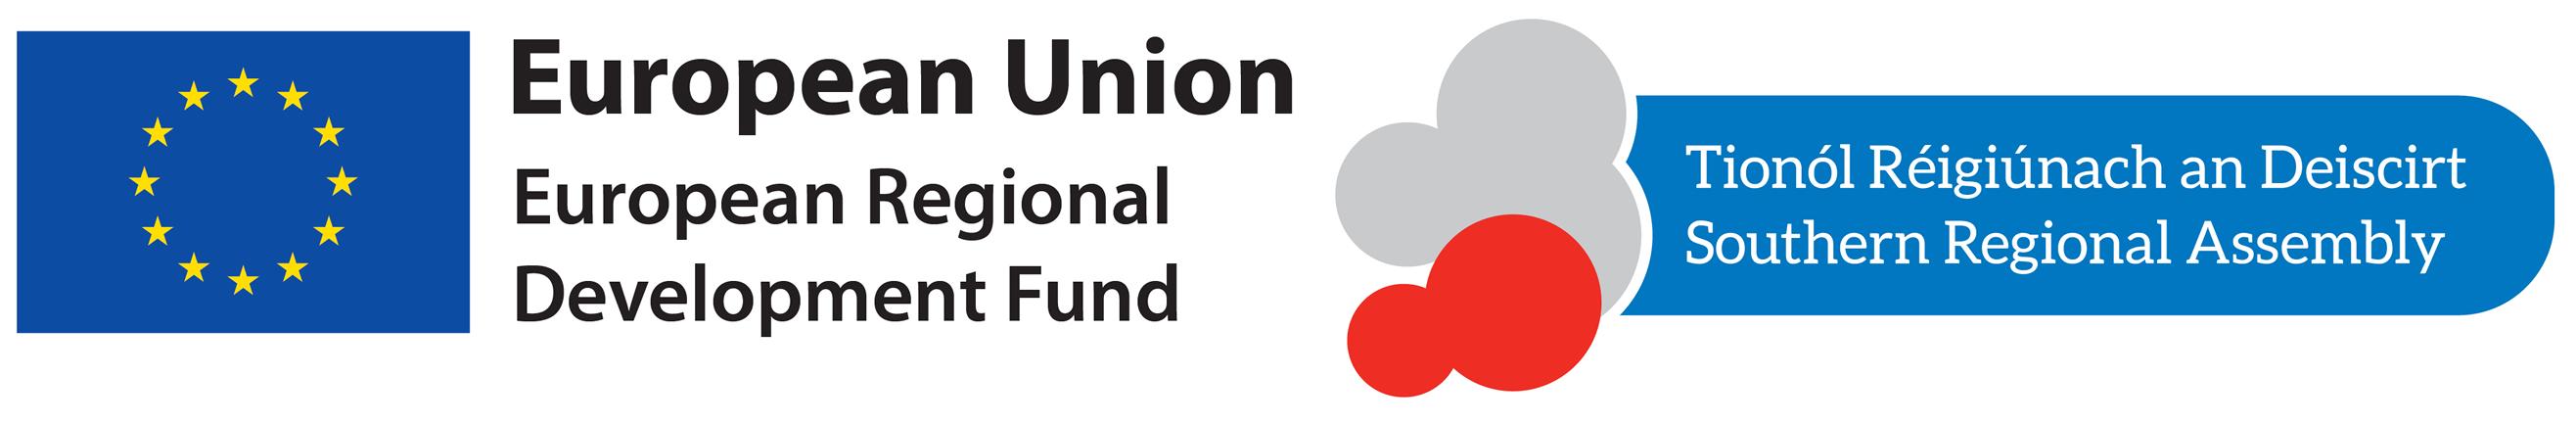 Southern Regional Assembly Logo